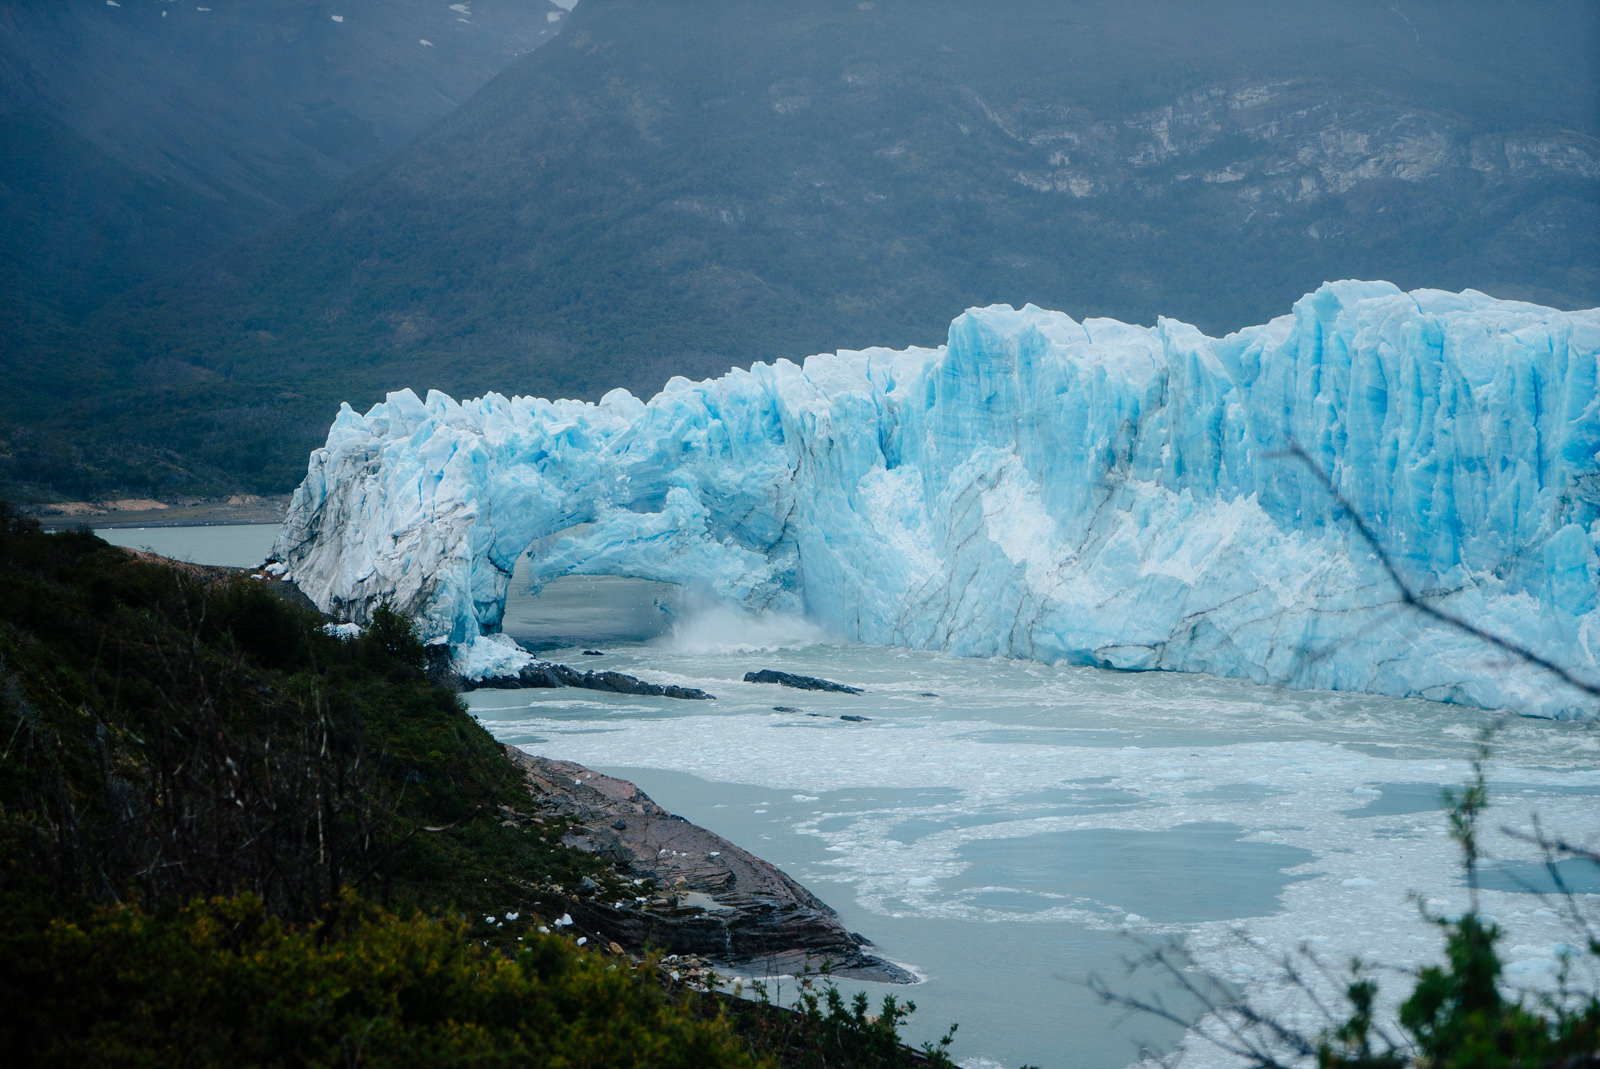 wrenee-perito-moreno-glacier-rupture-patagonia-argentina-2.jpg